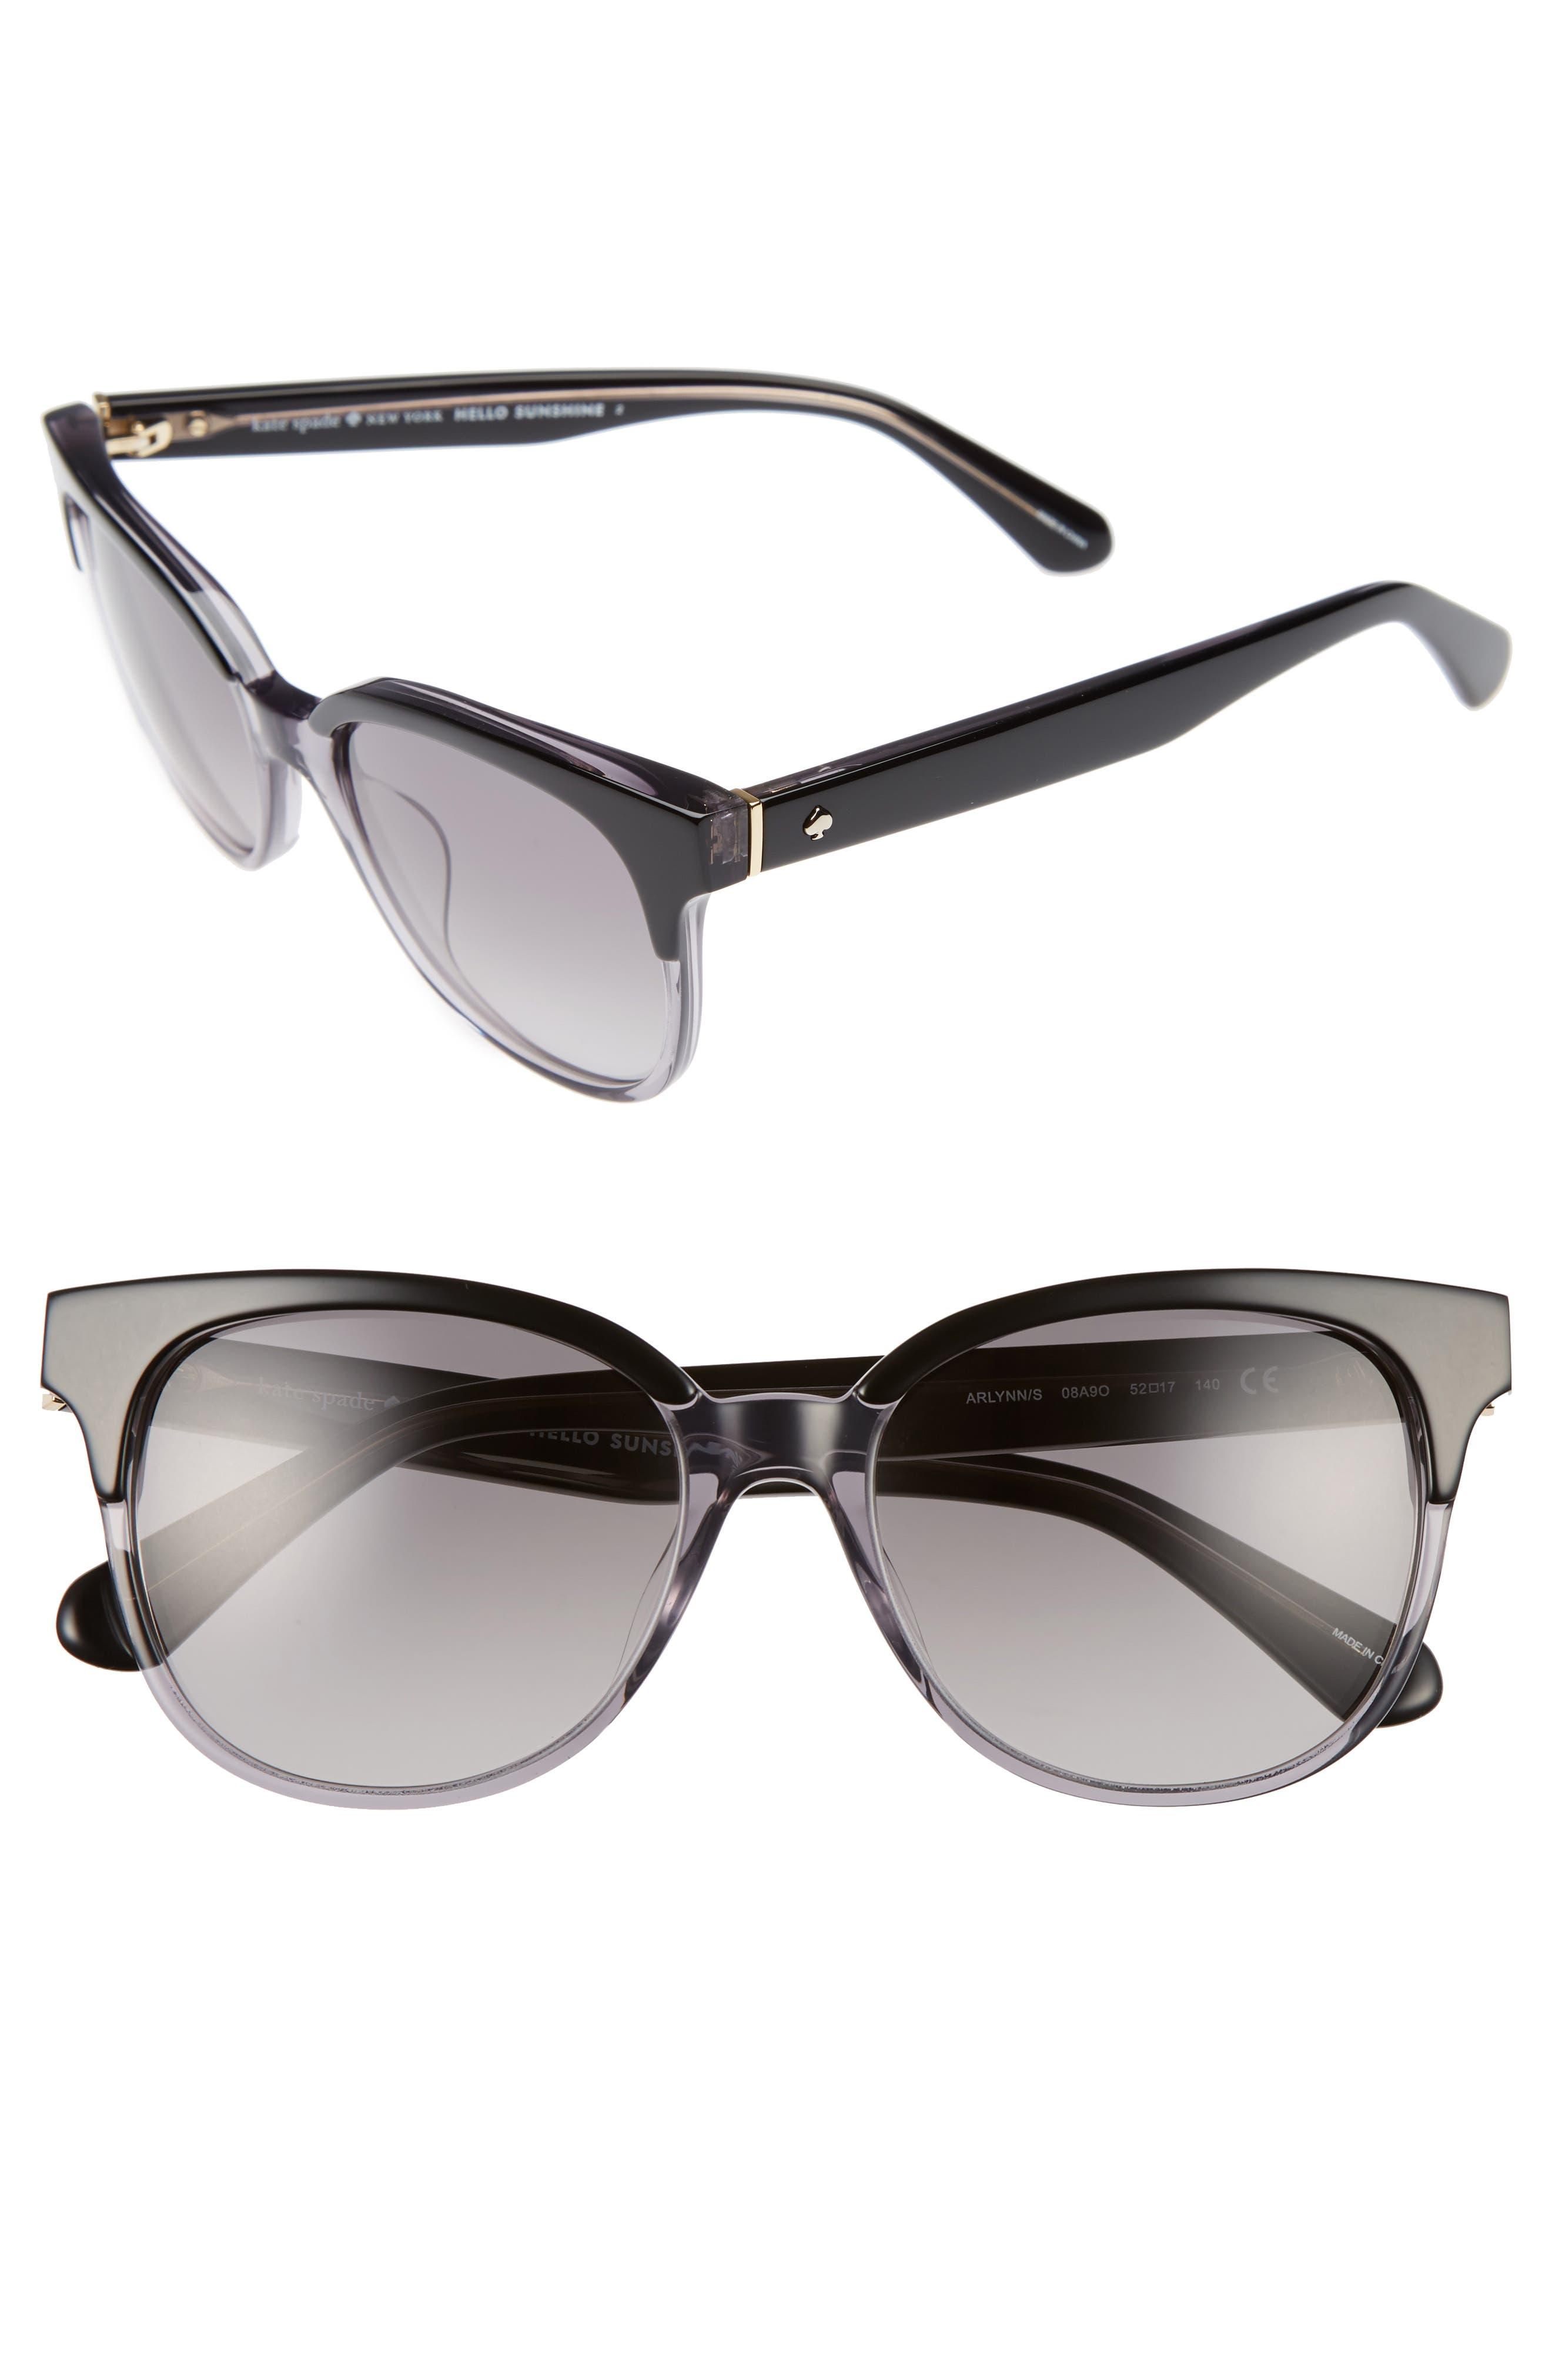 arlynn 52mm Sunglasses,                         Main,                         color, Black/ Grey